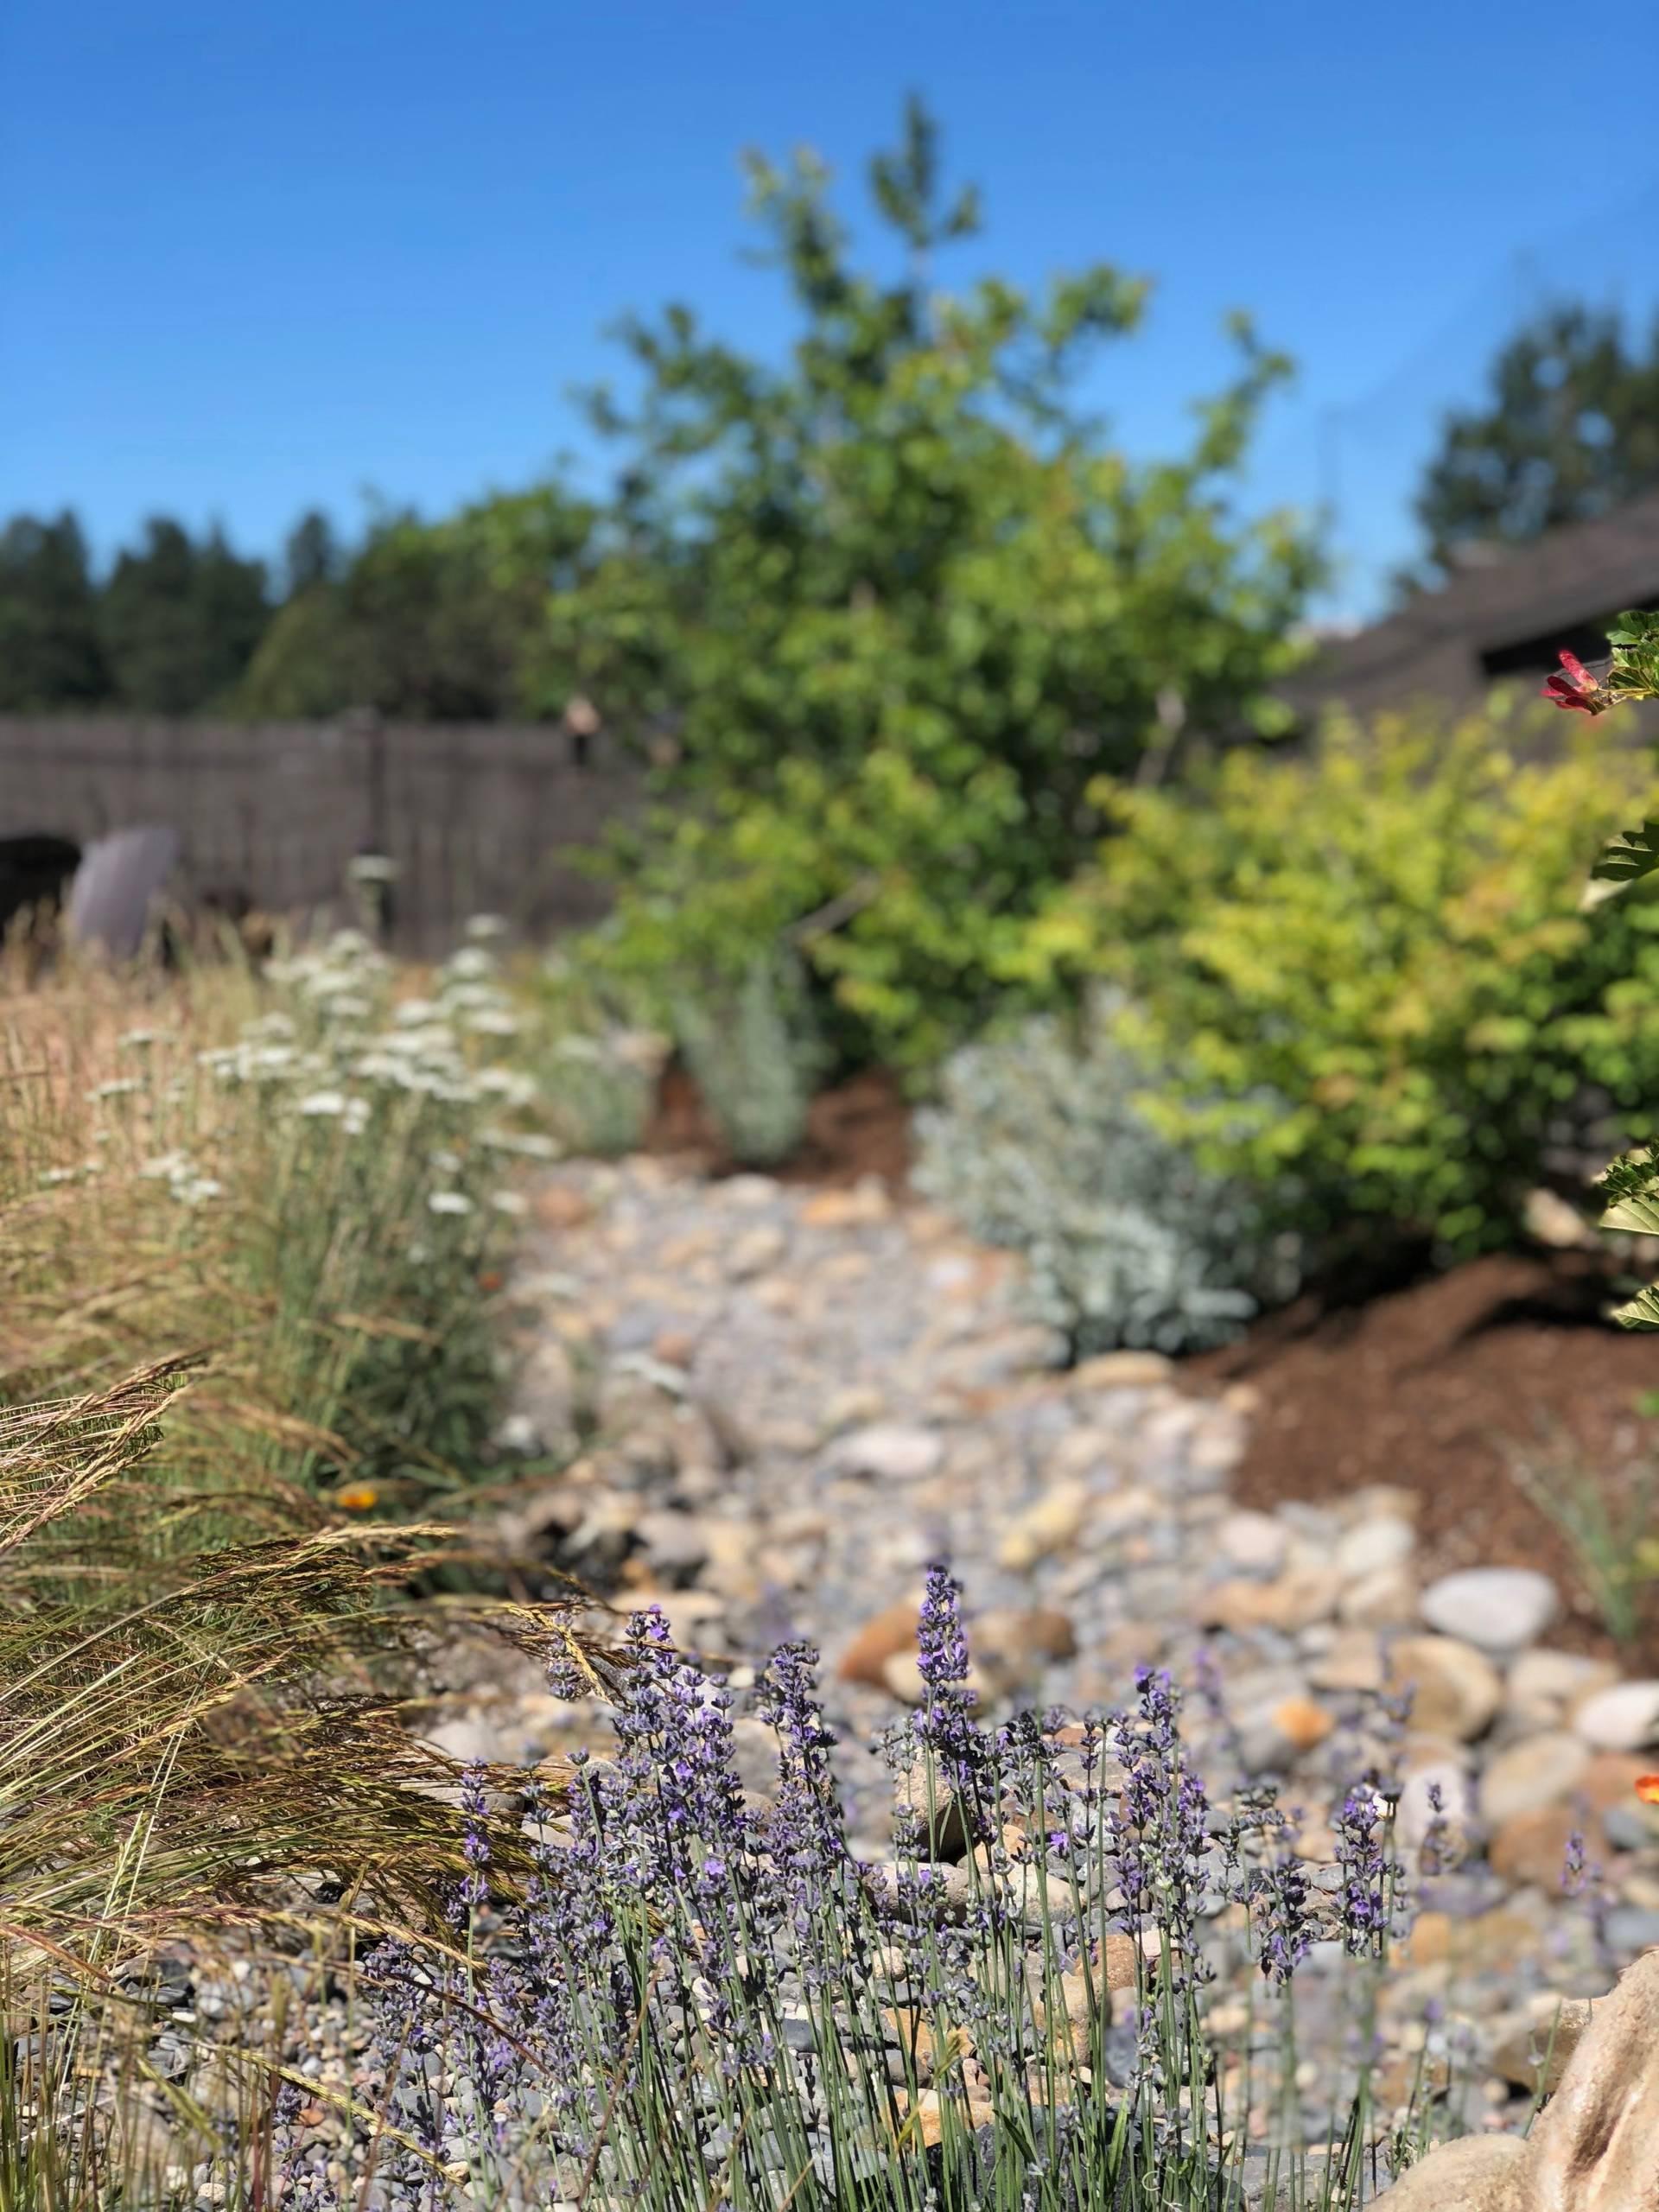 Private Botanical Garden - Old Farm District, Bend, Oregon